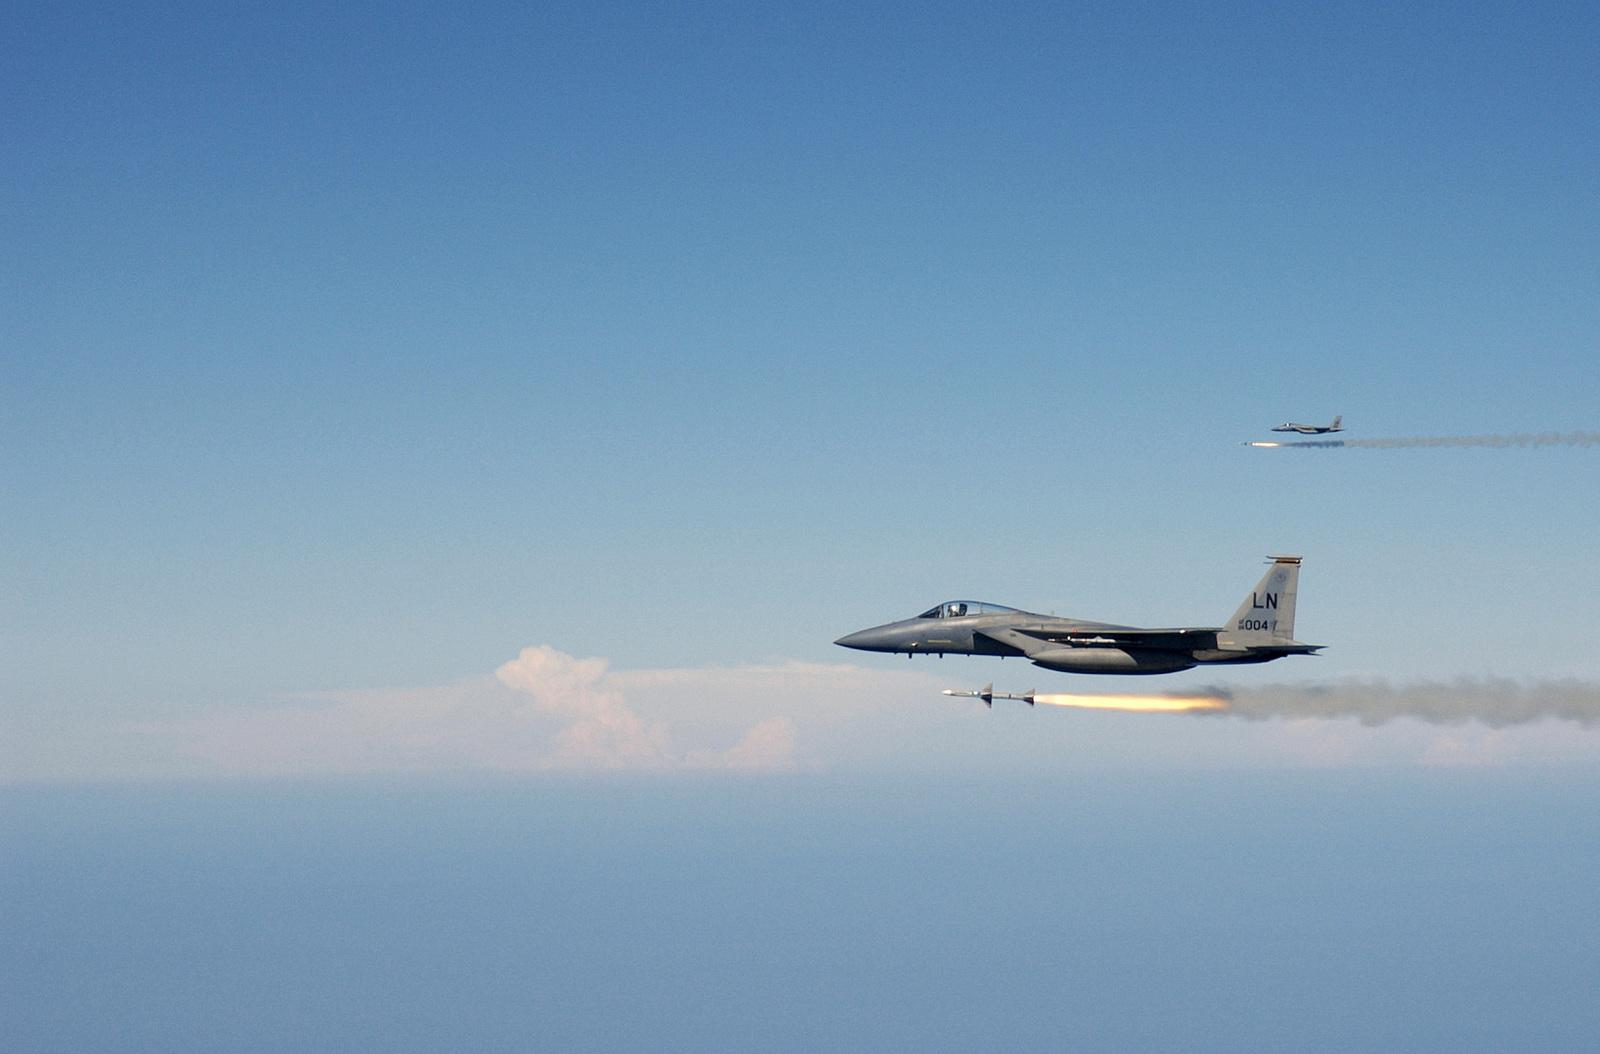 US Air Force (USAF) Captain (CPT) Matt